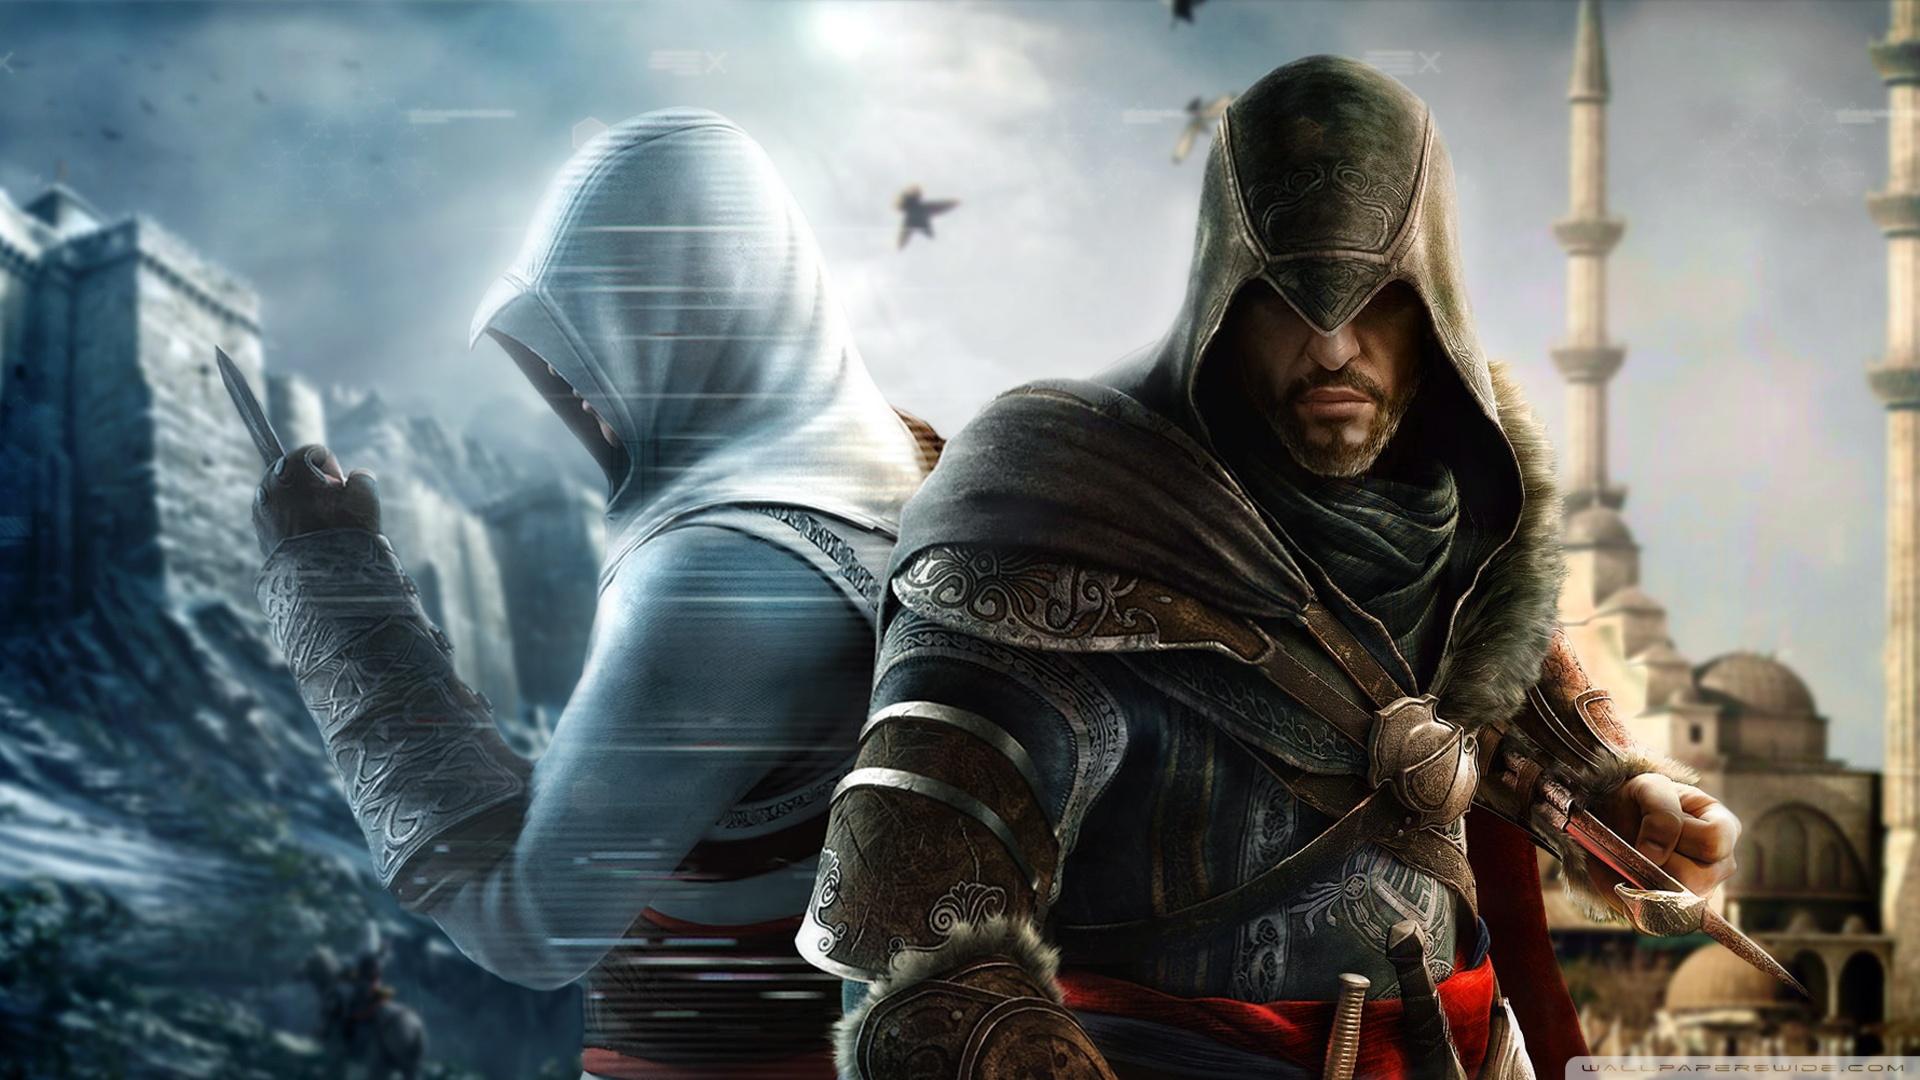 Assassins-Creed-Revelation-wallpaper-wp3402636